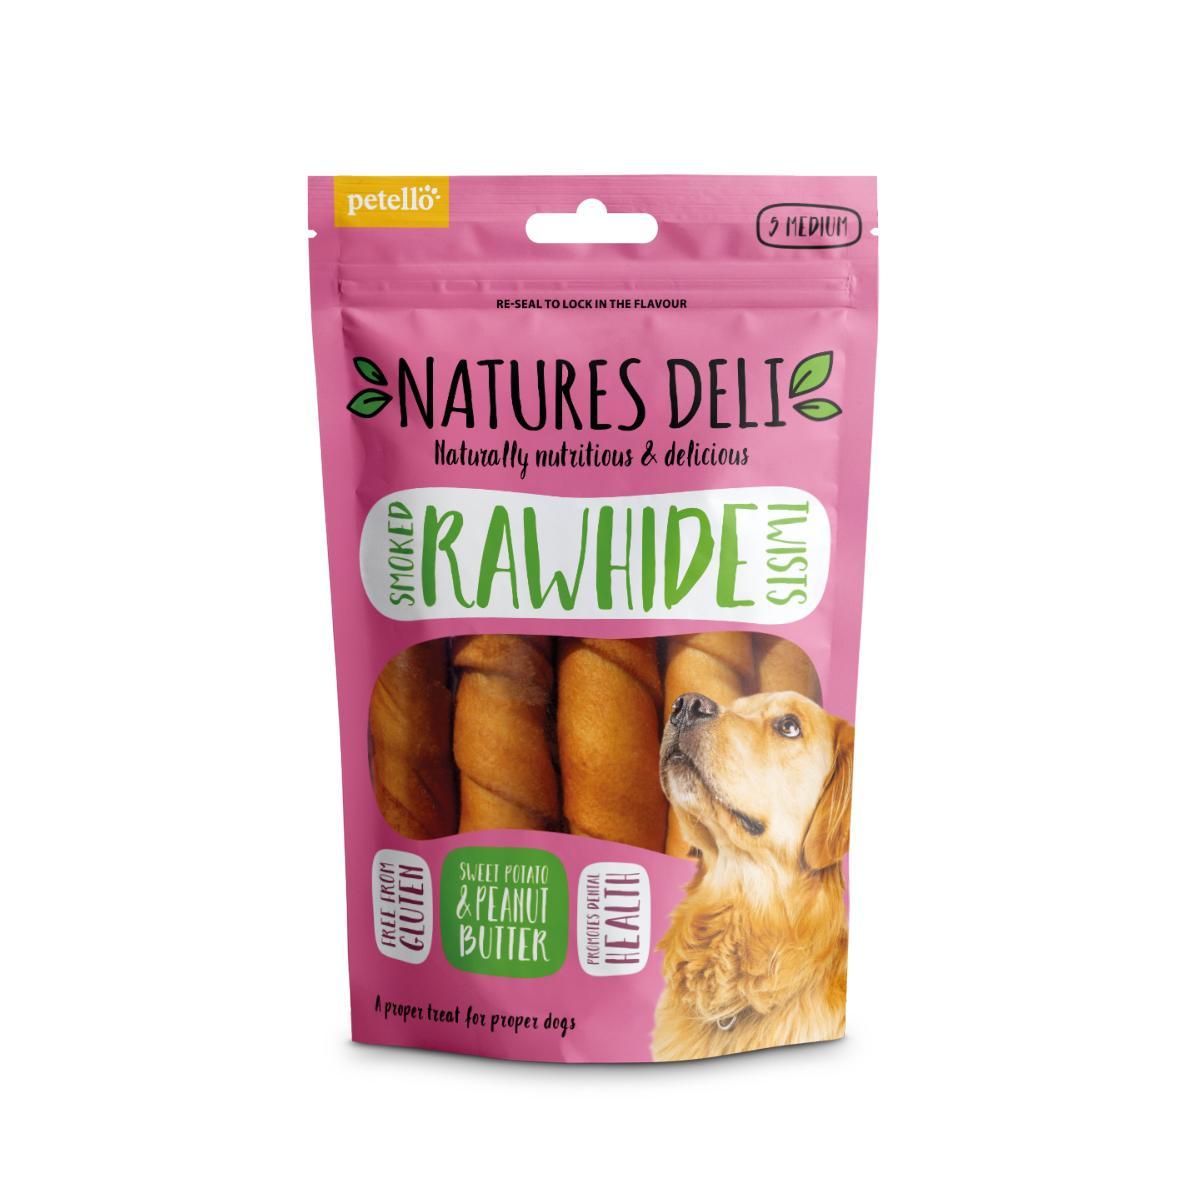 CLEARANCE Natures Deli Smoked Rawhide Twists Sweet Potato & Peanut Butter Medium 5pcs